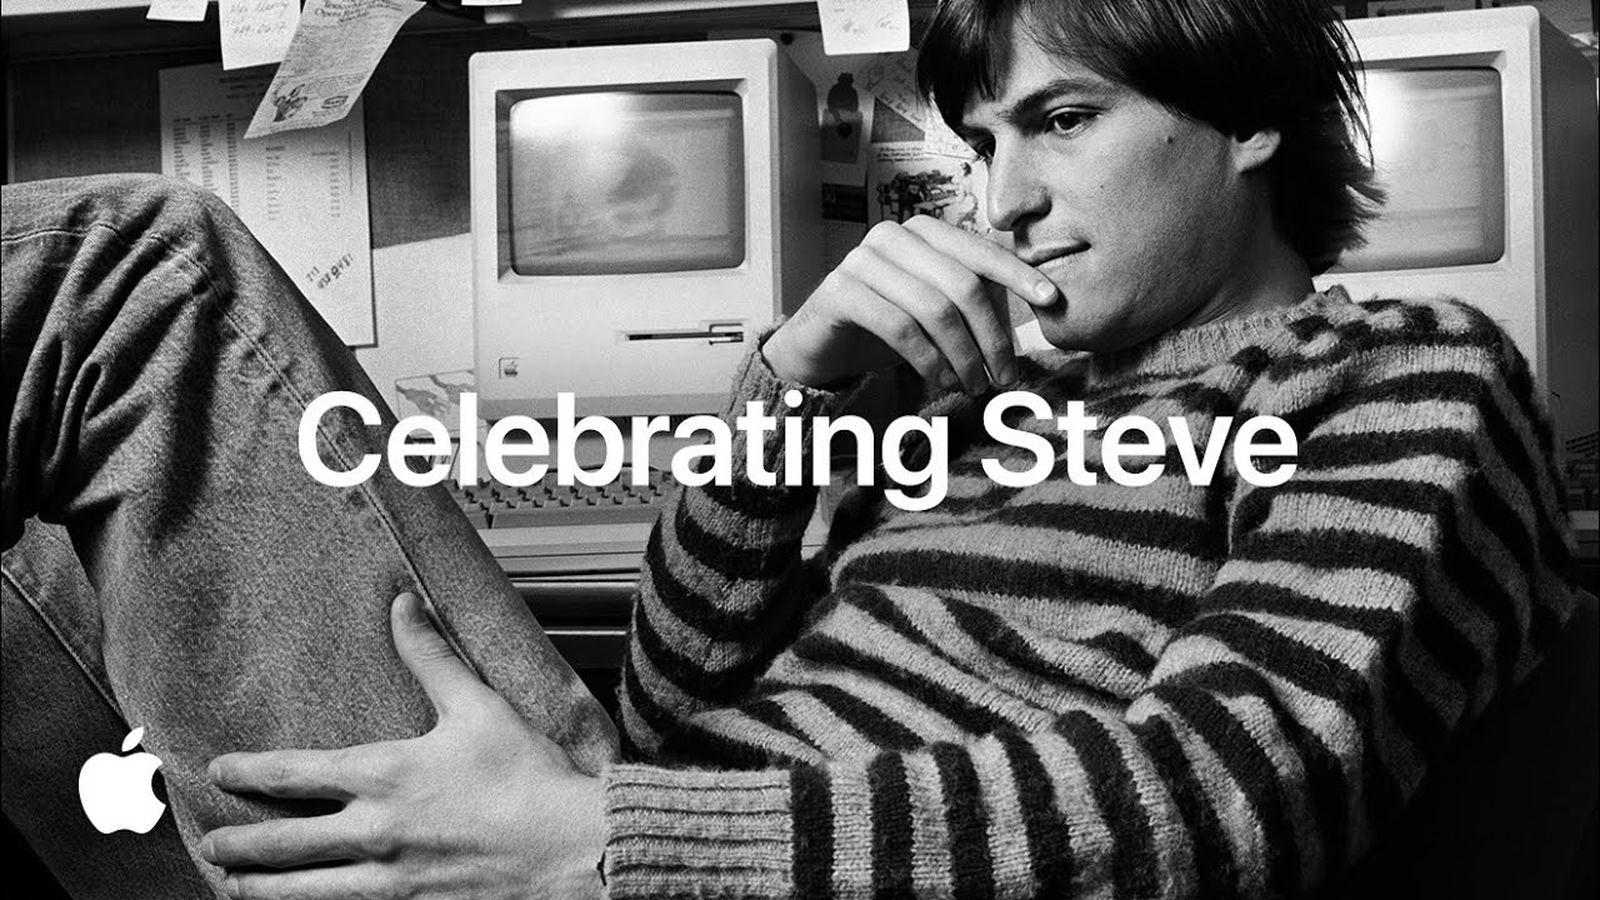 Apple Makes 'Celebrating Steve' Tribute Video Available on YouTube